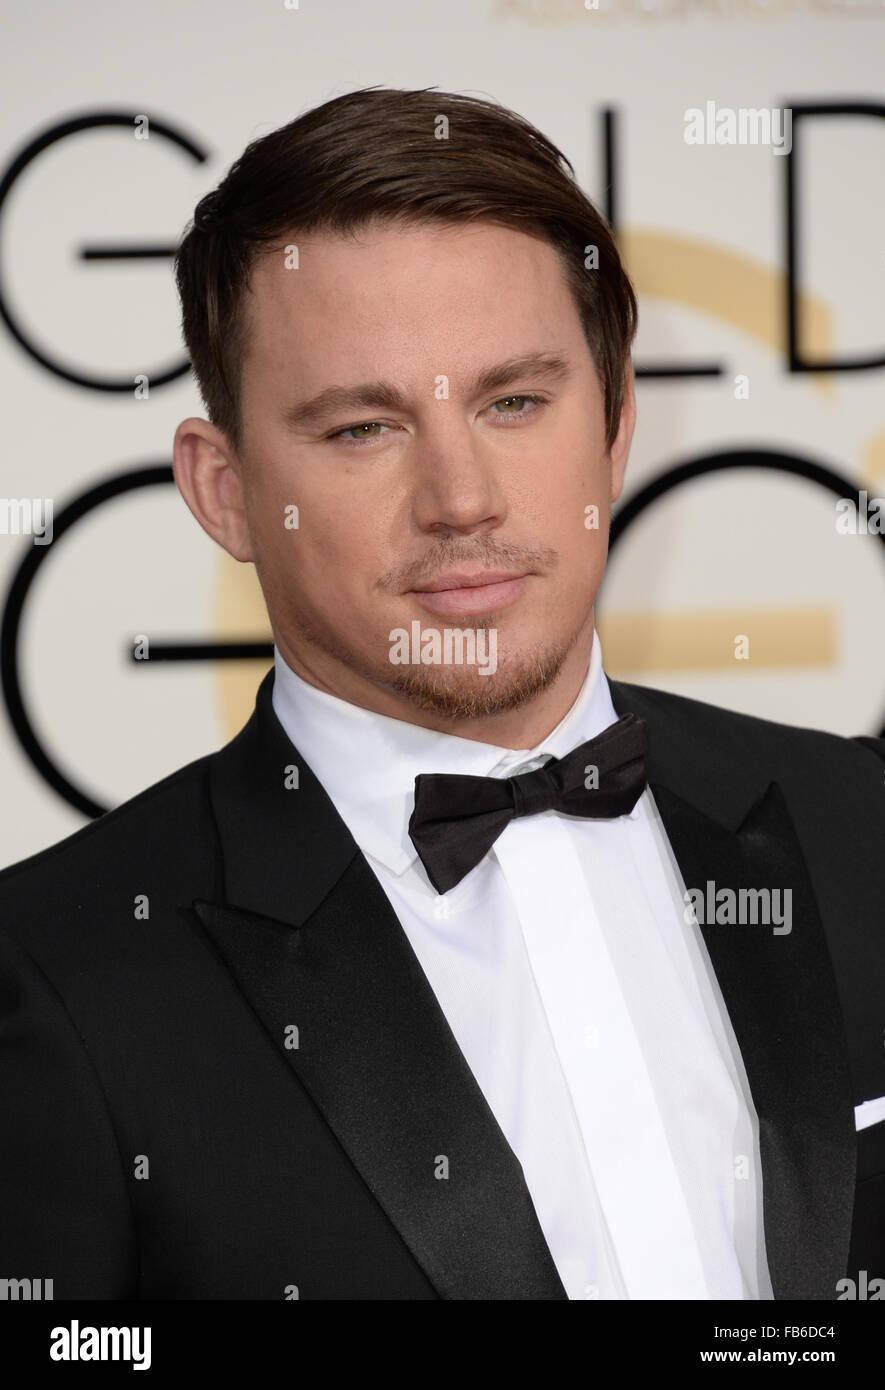 Los Angeles, Kalifornien, USA. 10. Januar 2016. Channing Tatum kommt bei den Golden Globes, Los Angeles, CA-Credit: Stockfoto